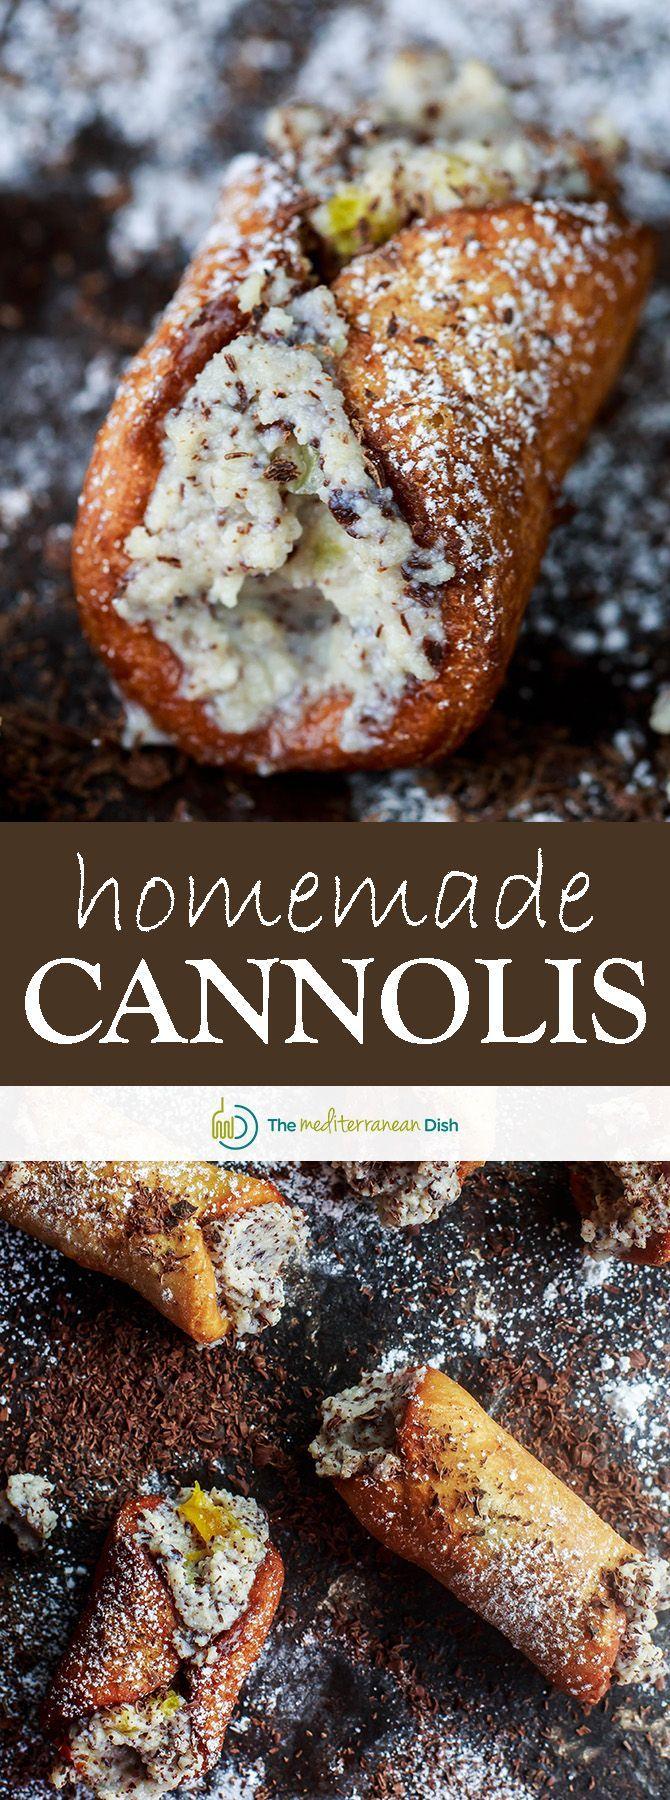 cannoli recipe how to make cannolis the mediterranean